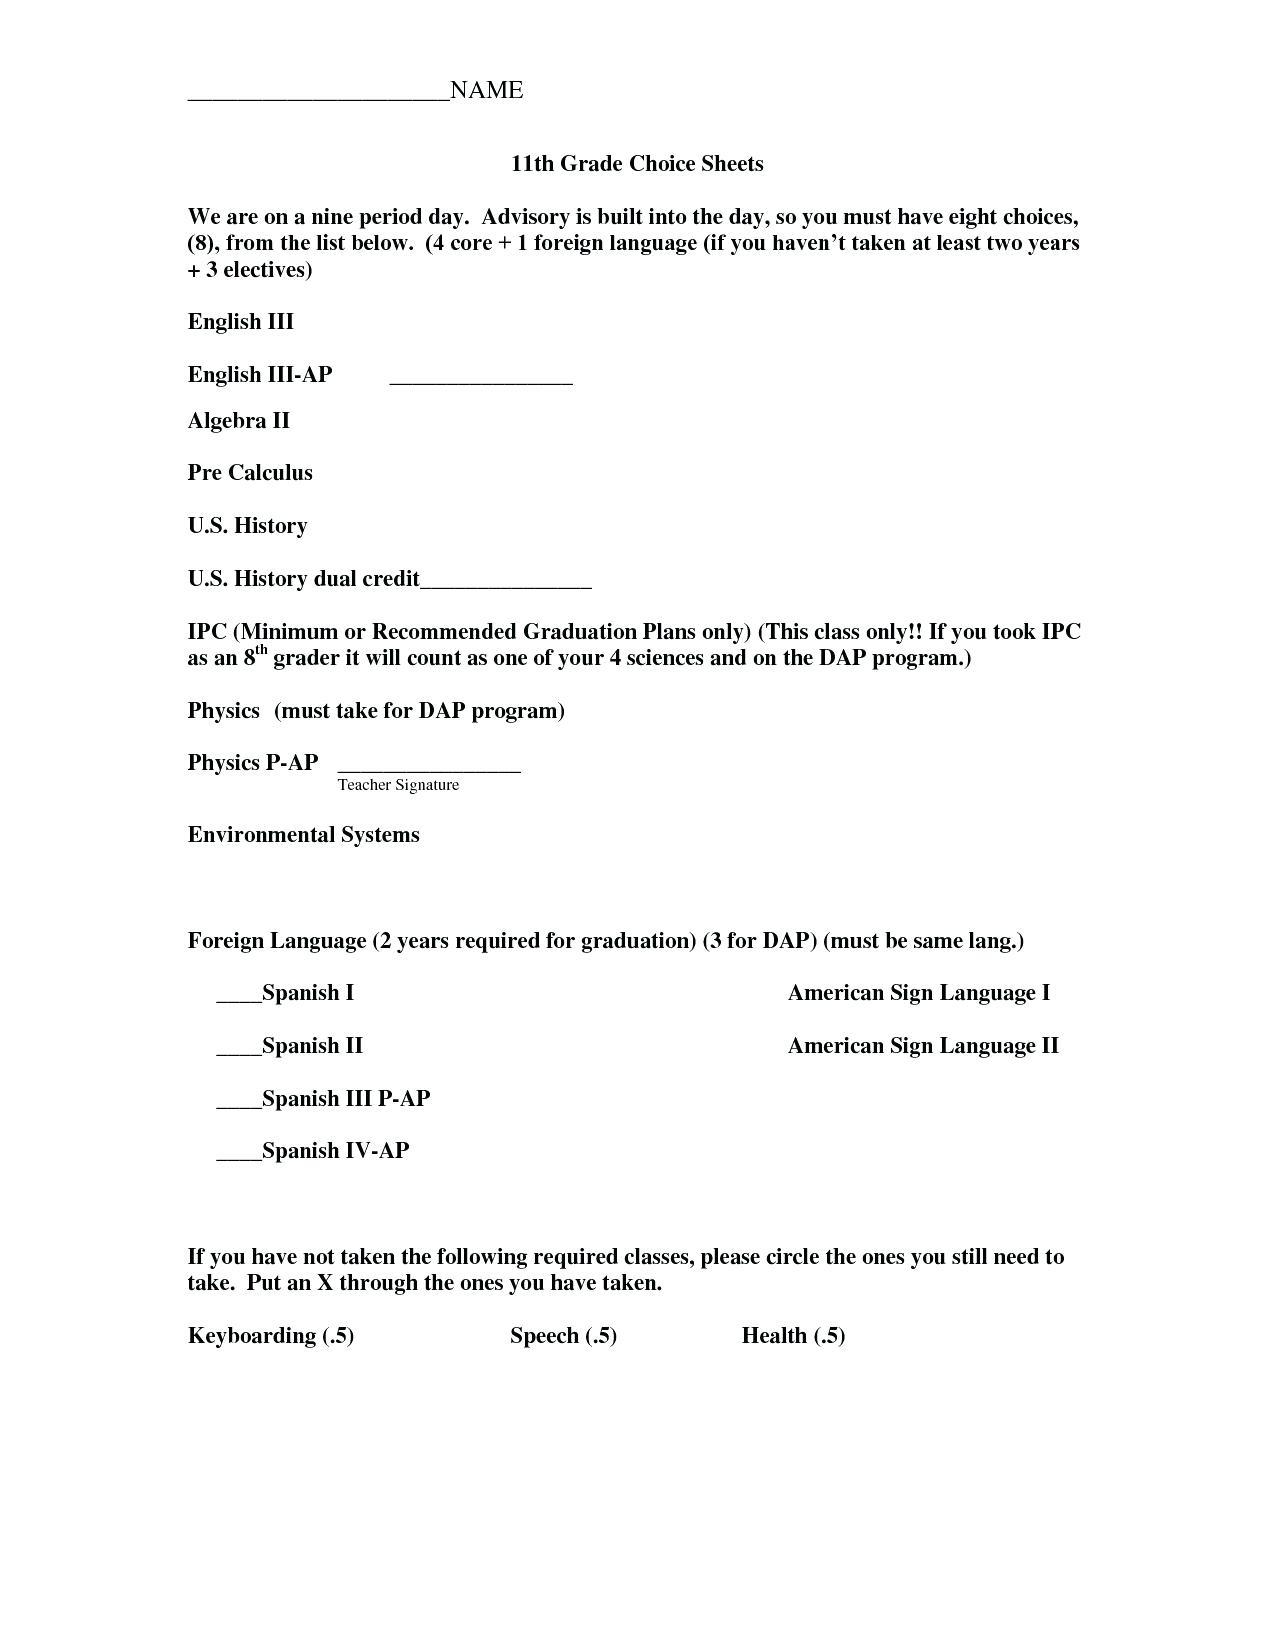 9Th Grade Language Arts Worksheets – Doublerbitcoin.club - 9Th Grade English Worksheets Free Printable